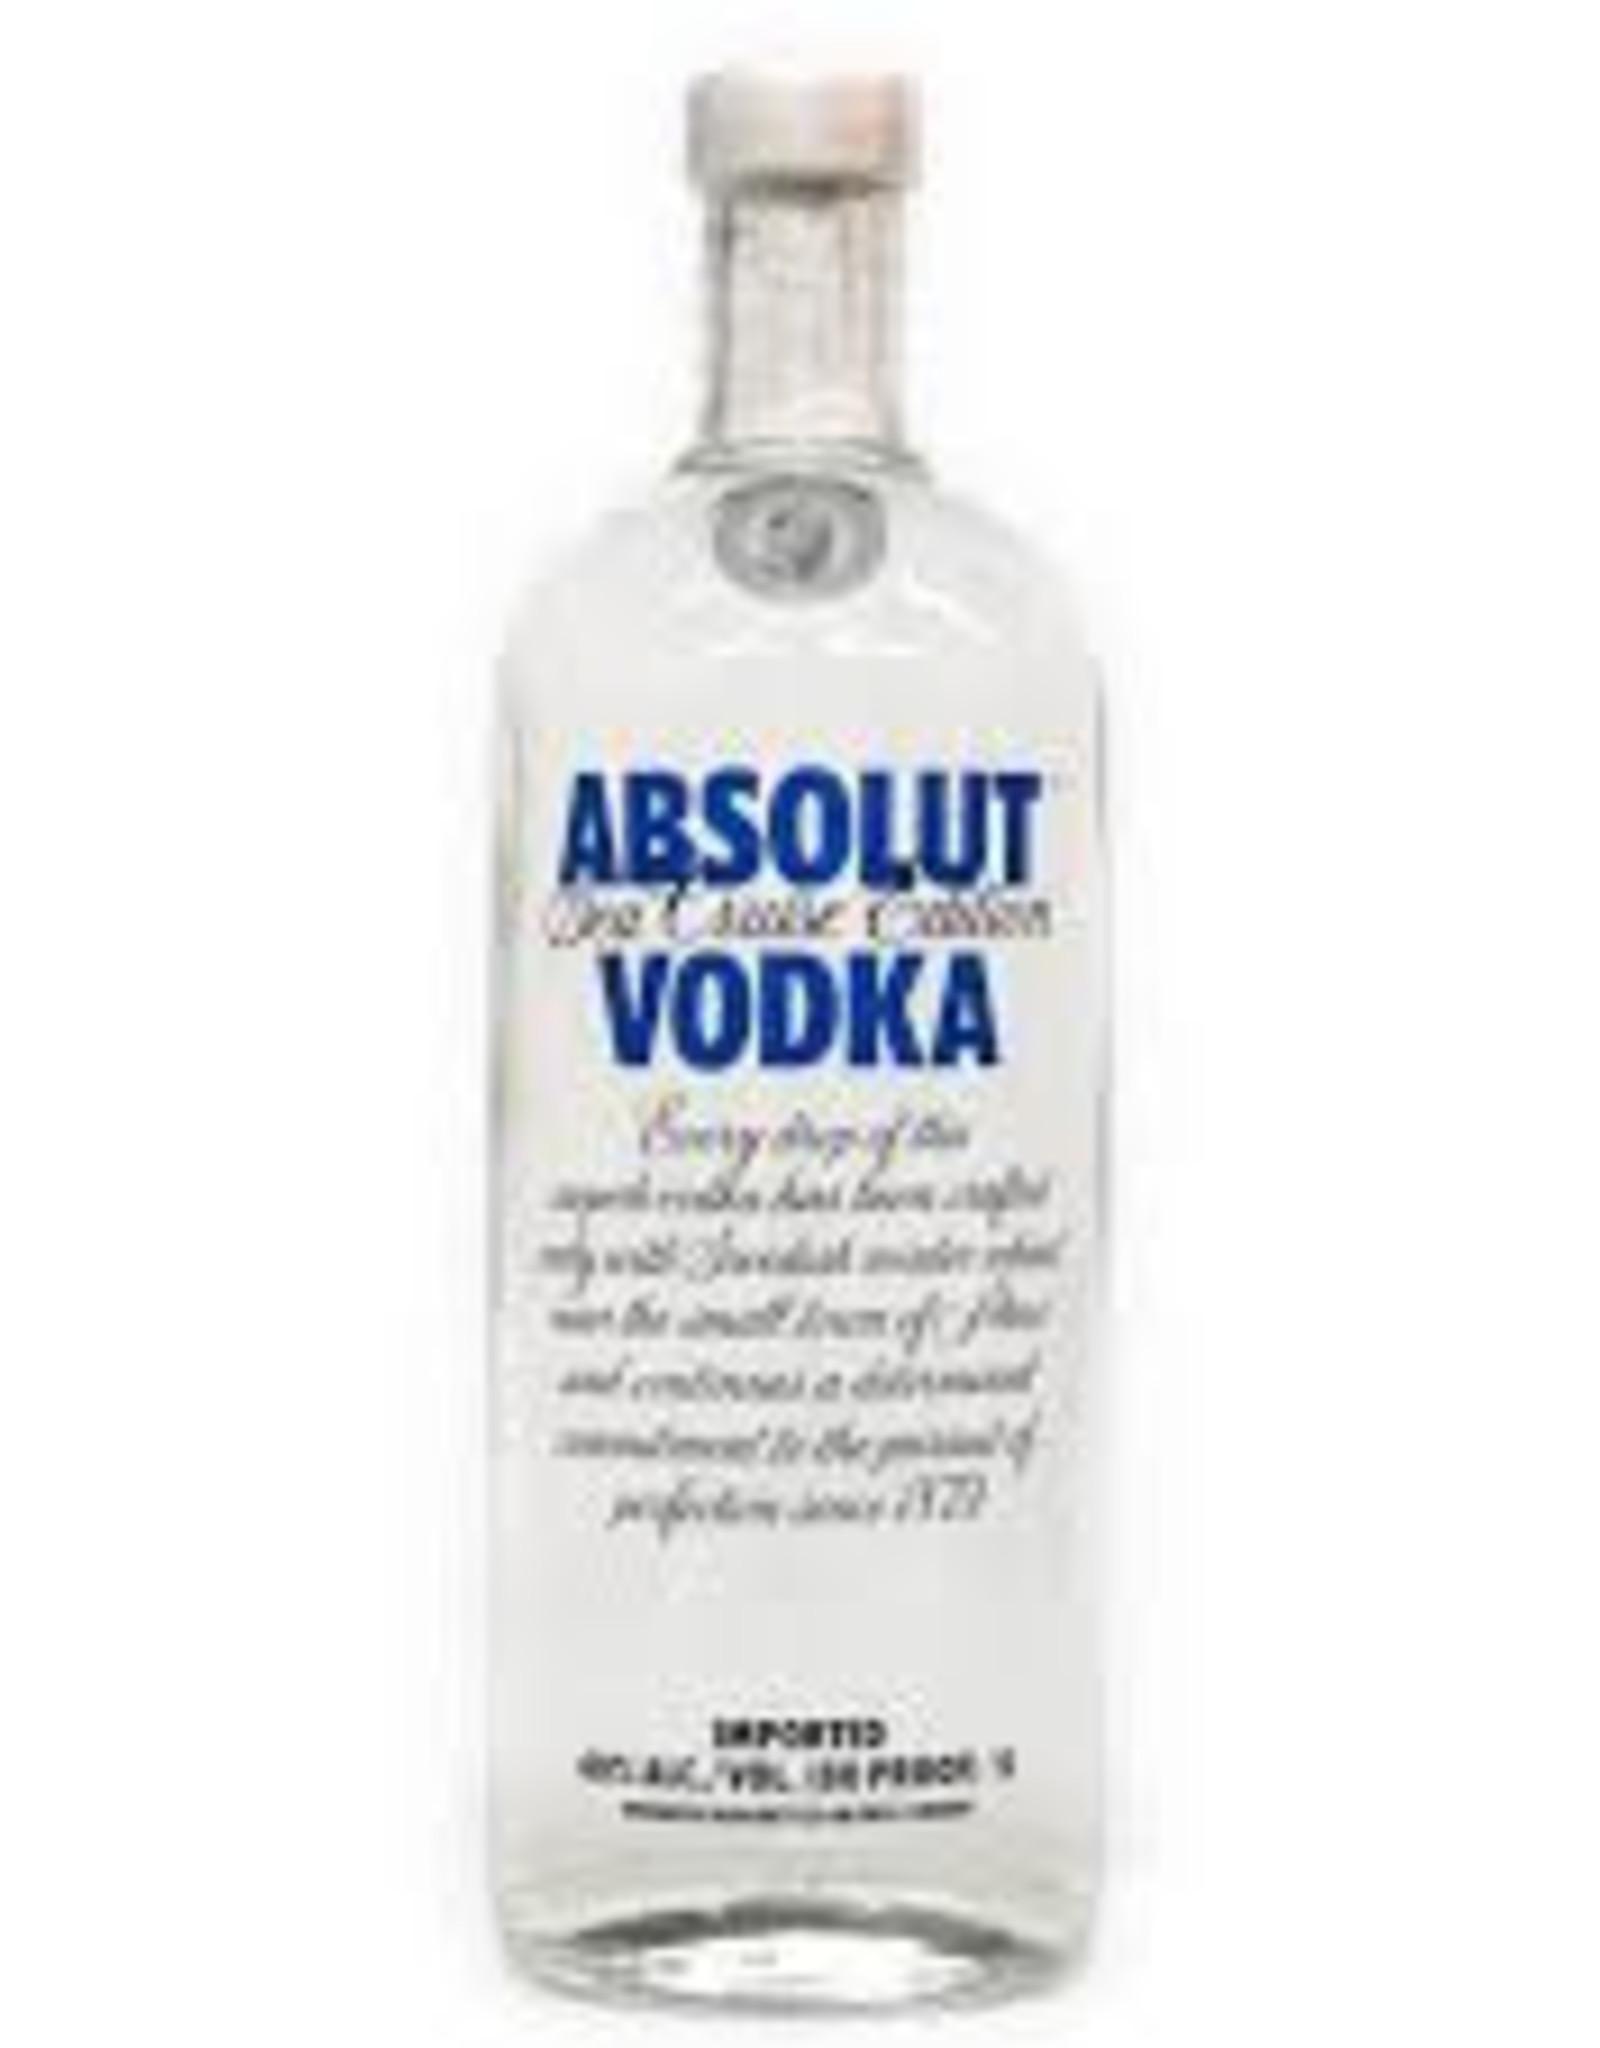 Absolut Vodka, 40%, 4500 ml